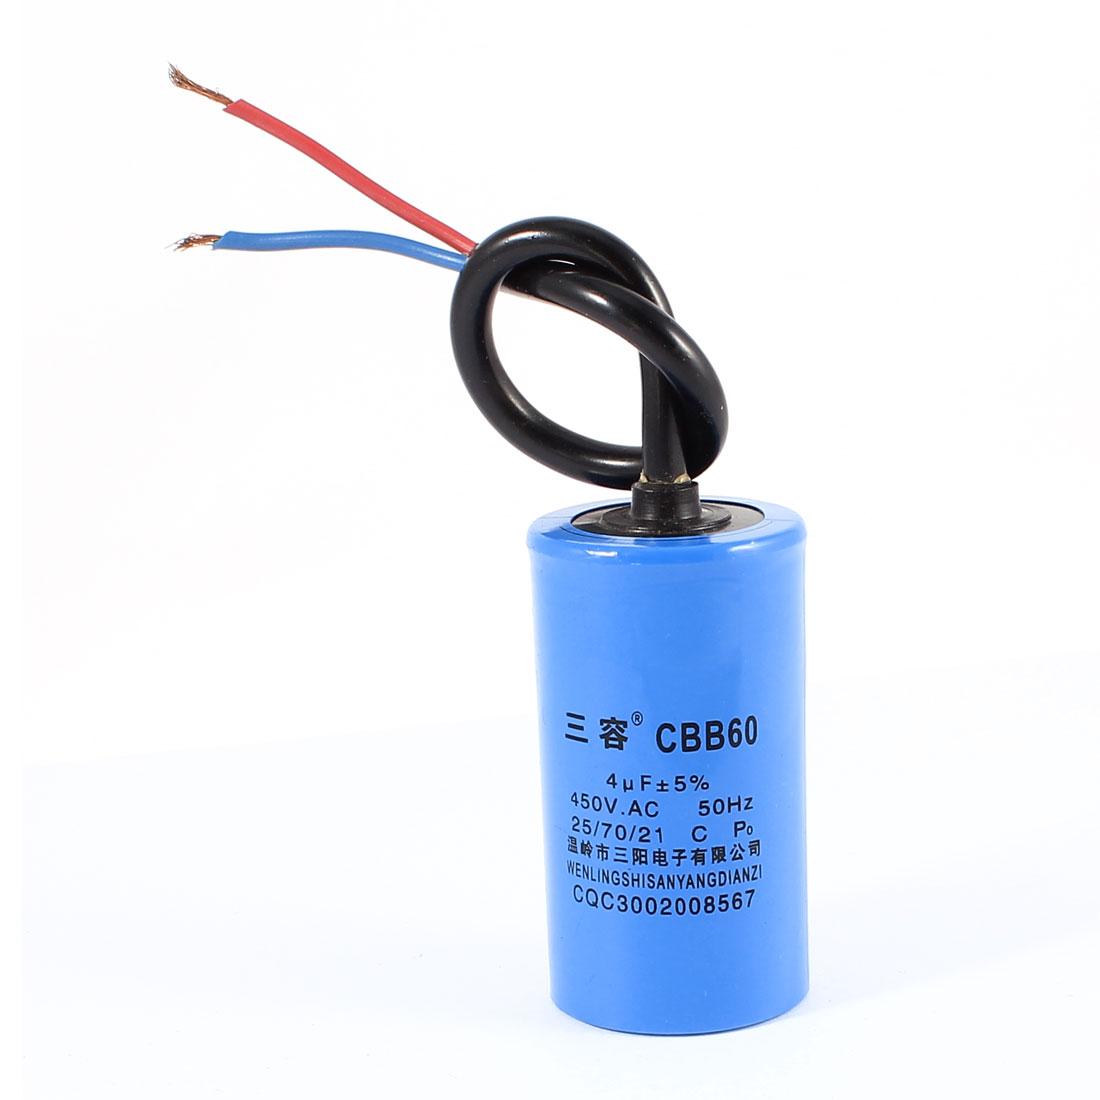 CBB60 AC 450V 4uF Double Wire Leads Cylindrical Polypropylene Film Motor Start Run Capacitor Blue for Washing Machine